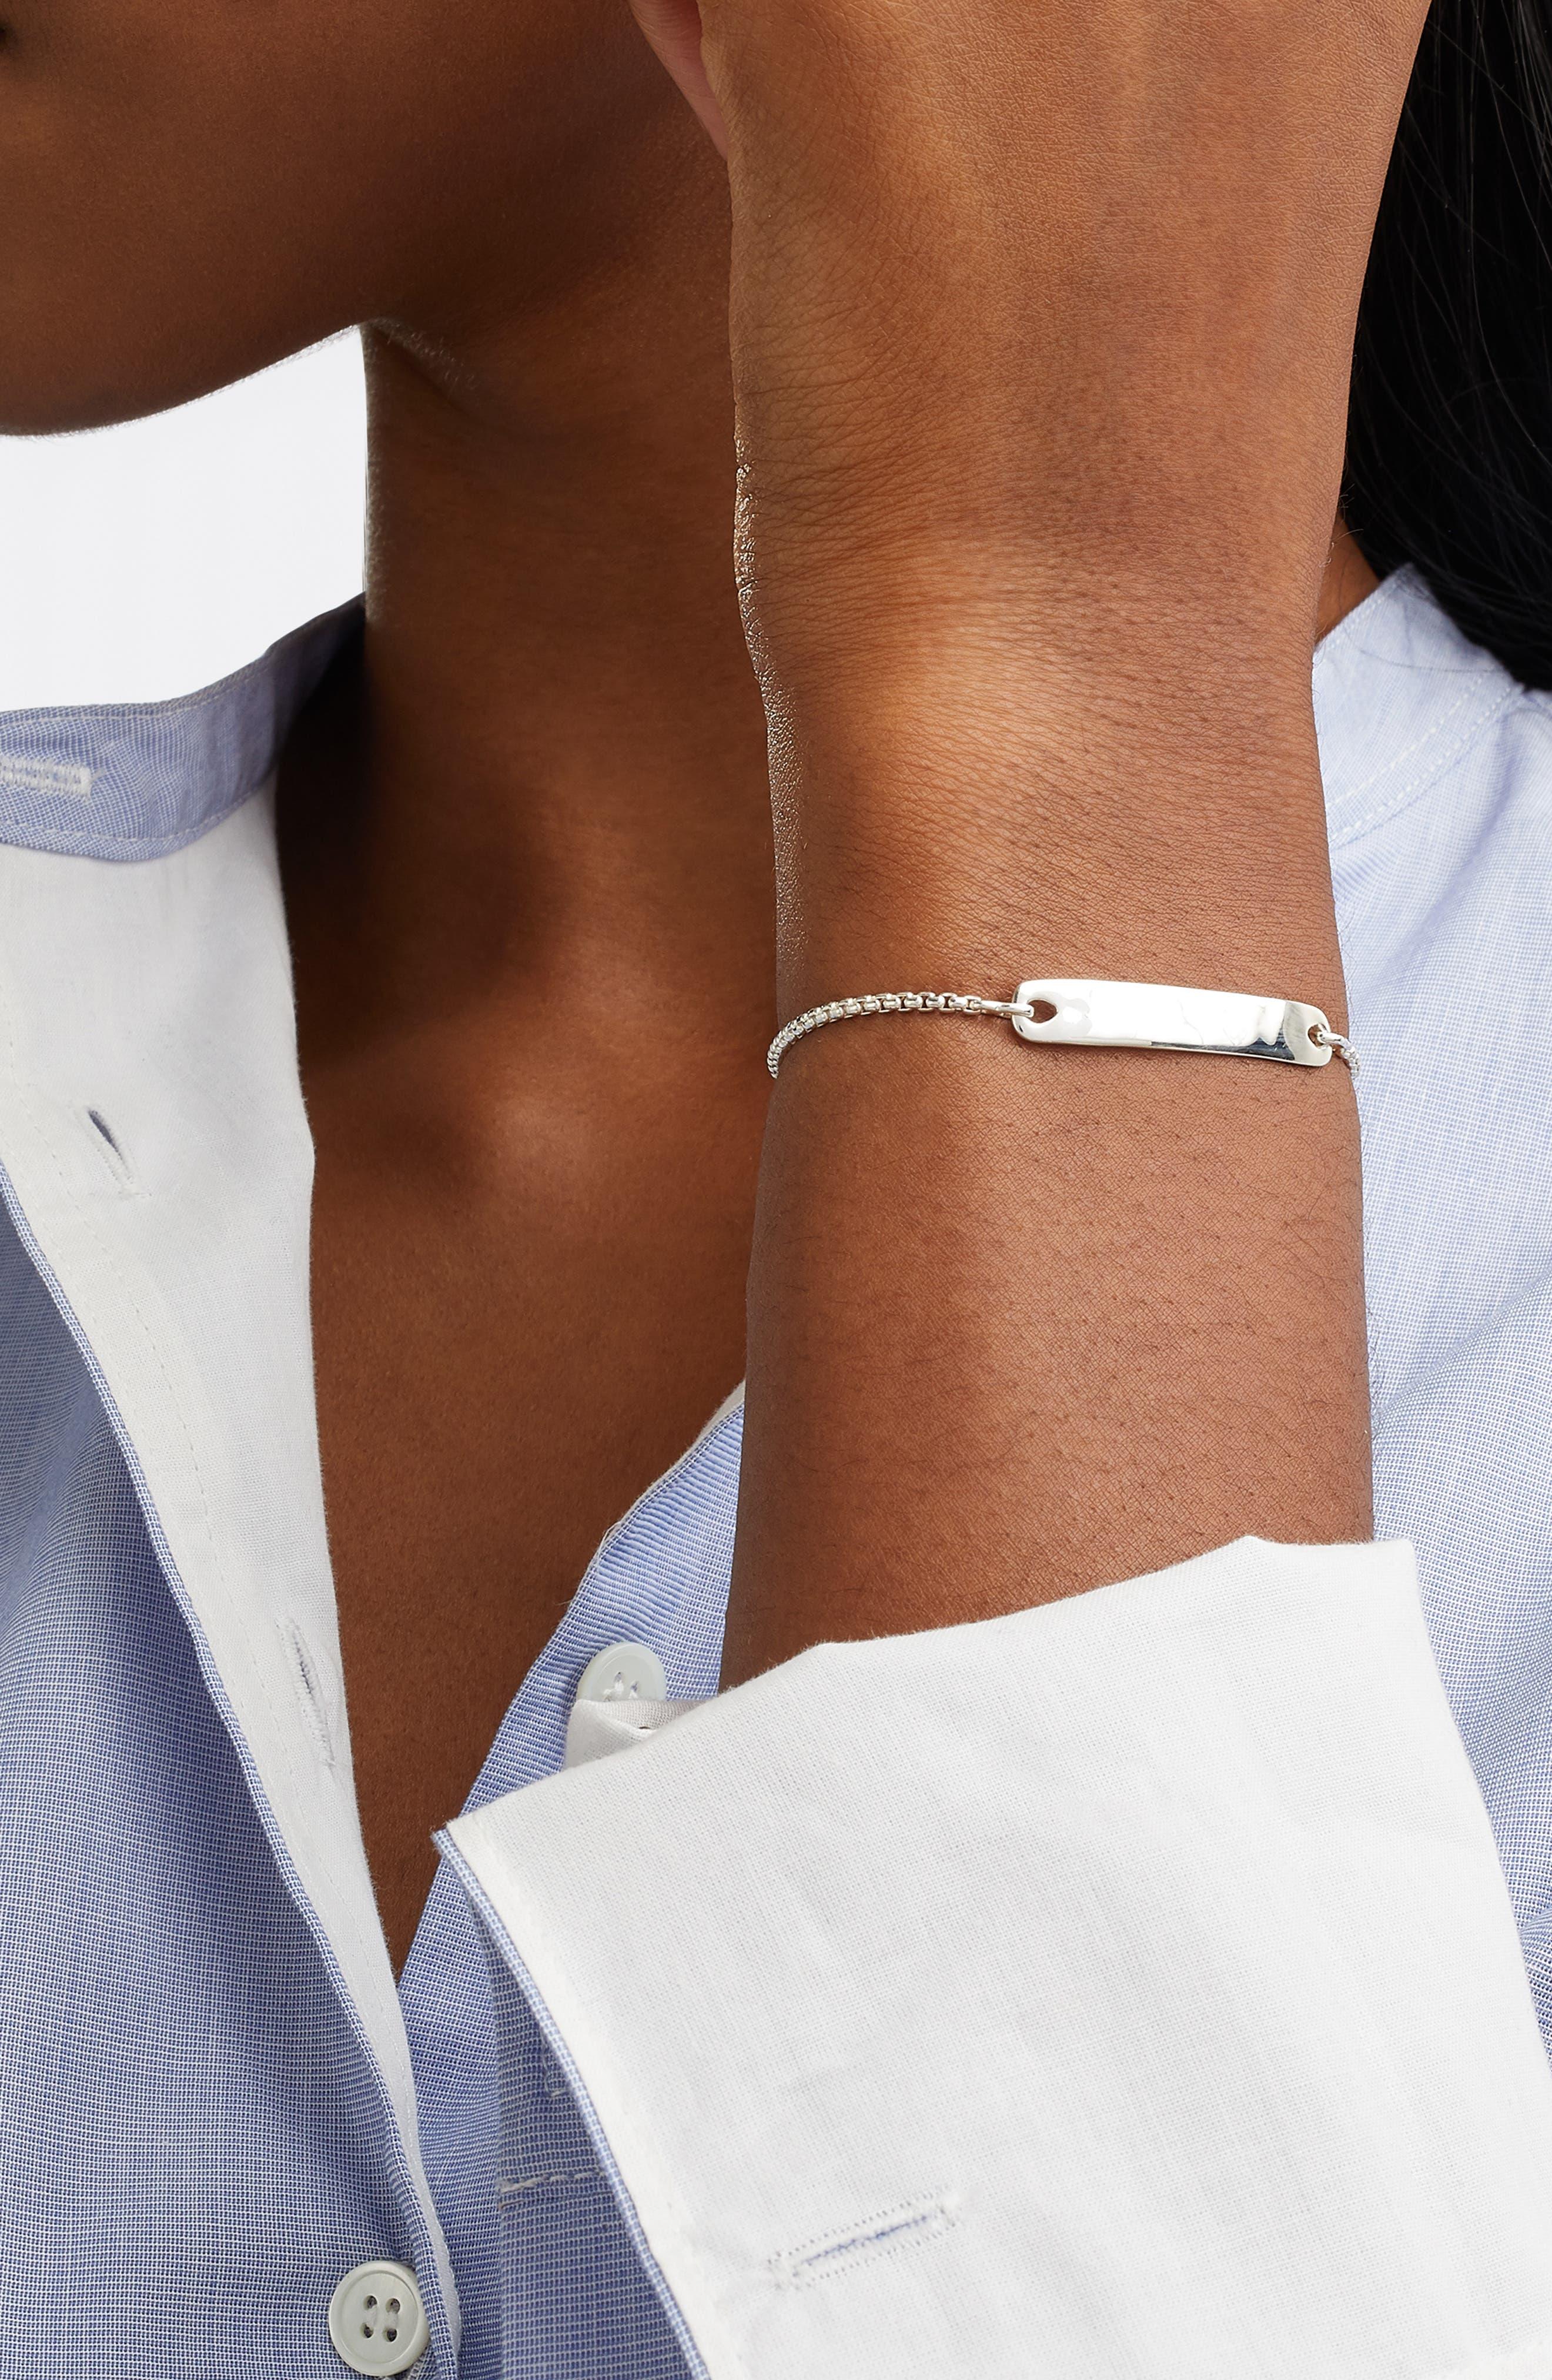 MONICA VINADER, Engravable Havana Friendship Chain Bracelet, Alternate thumbnail 2, color, SILVER